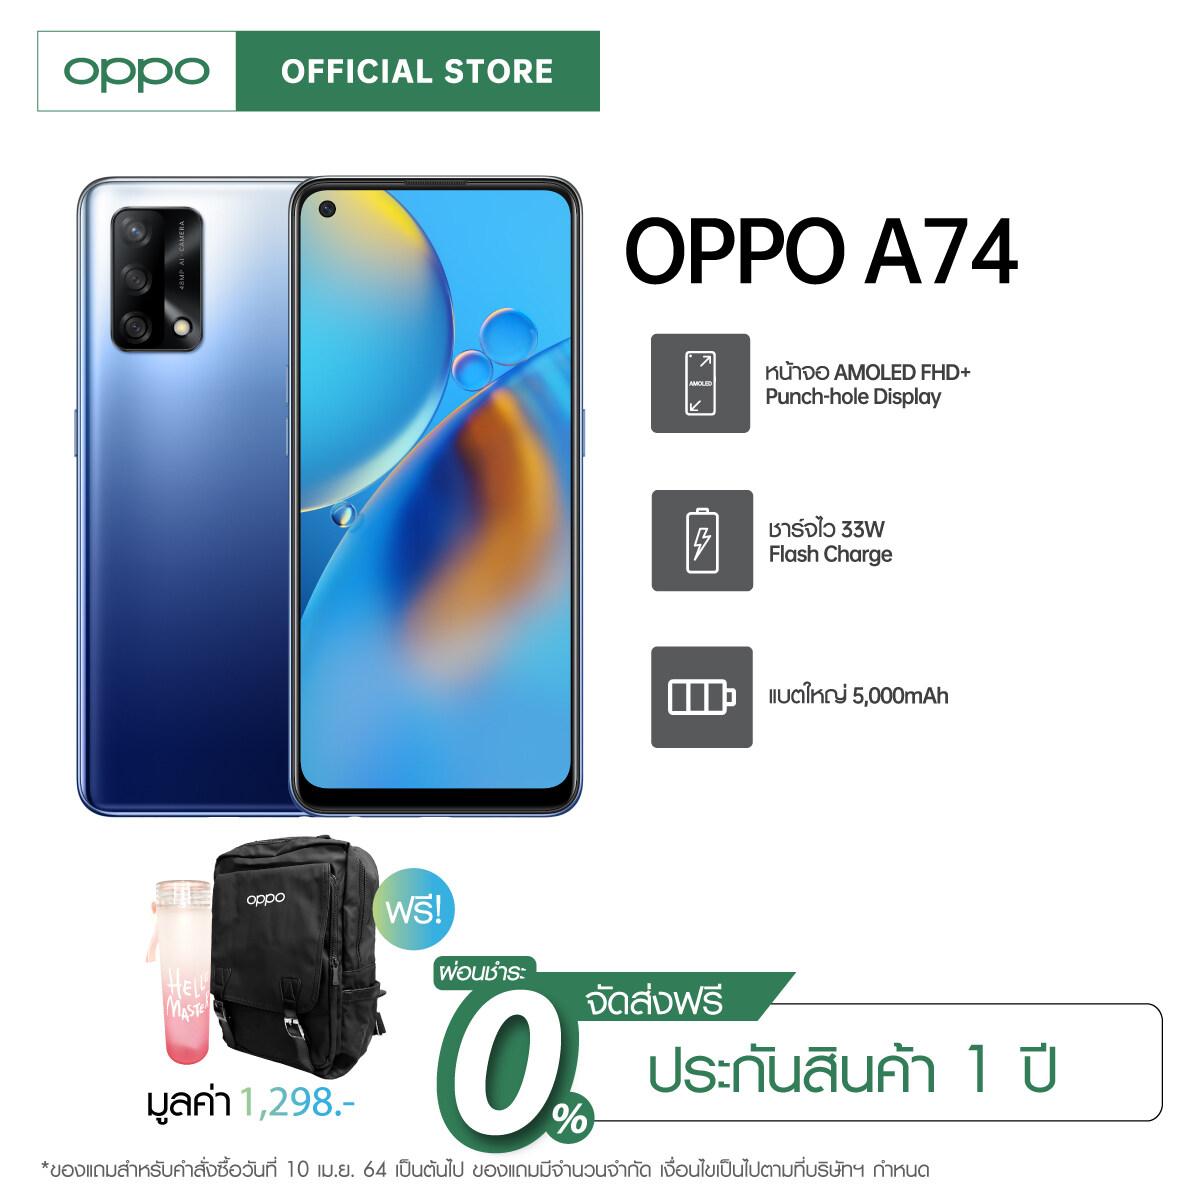 [Pre-Order 10-20 เม.ย.] OPPO A74 (6+128) โทรศัพท์มือถือ ดีไซน์บางเบา แบตเตอรี่ 5000 mAh พร้อมของแถม รับประกัน 12 เดือน [จัดส่ง 21 เม.ย.]